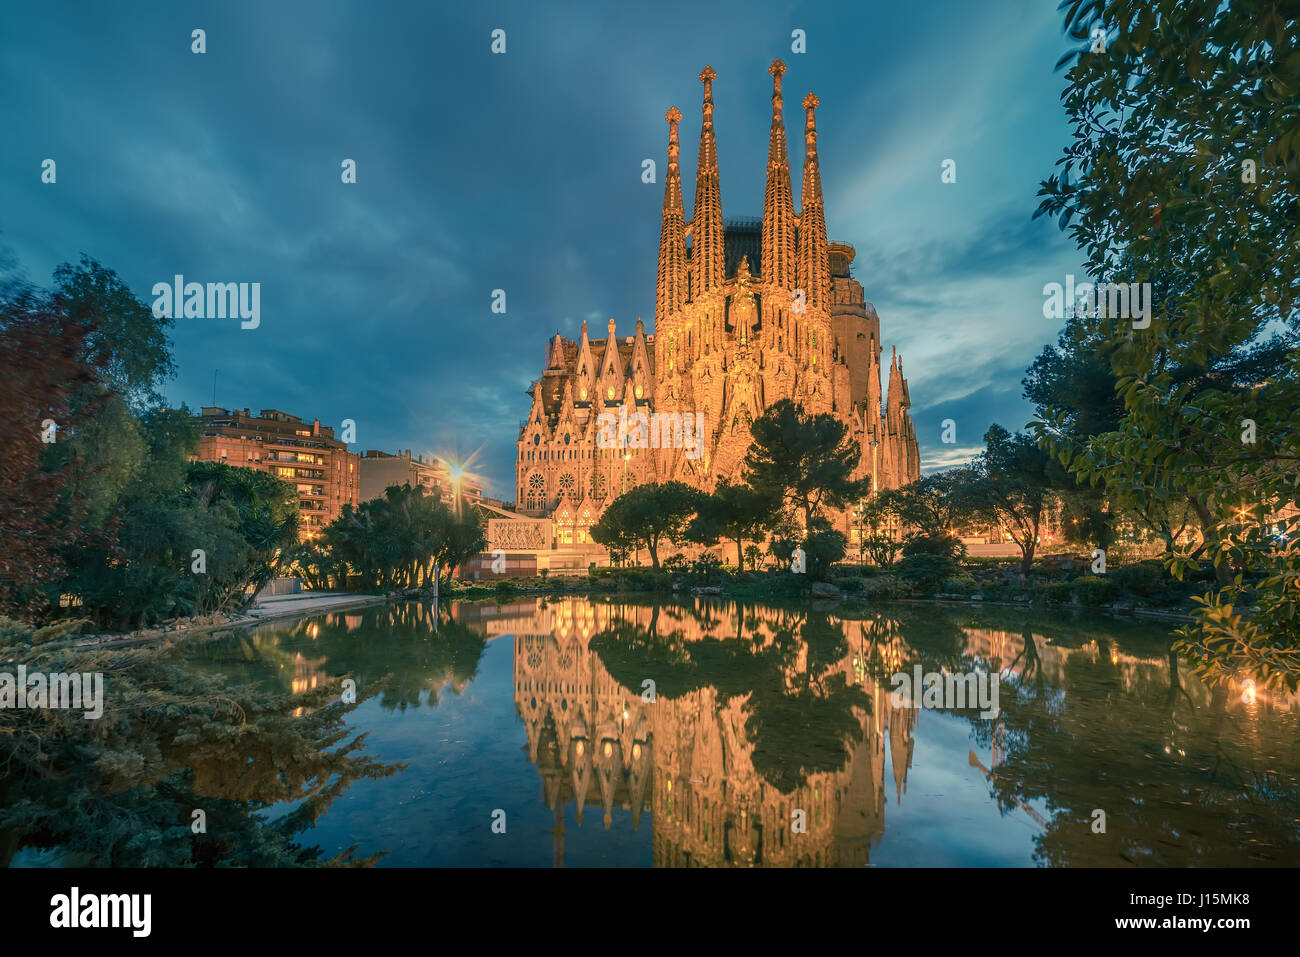 Barcelona, Cataluña, España: Basicila expiatorio y la iglesia de la Sagrada Familia, conocido como la Imagen De Stock